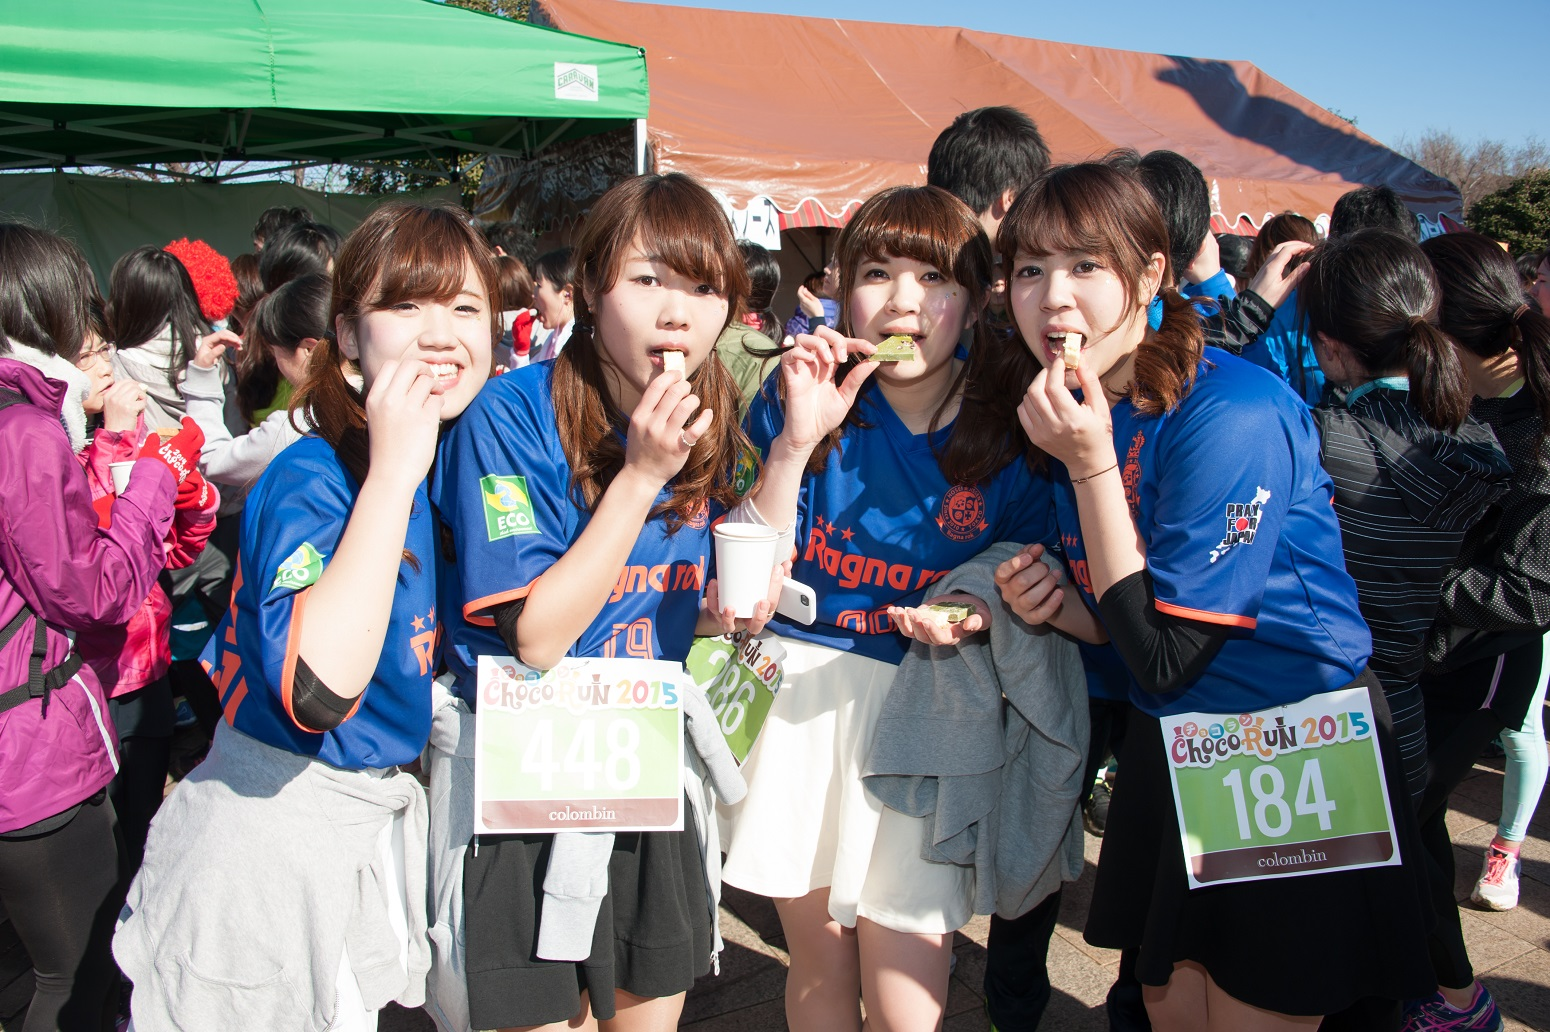 choko run 2016